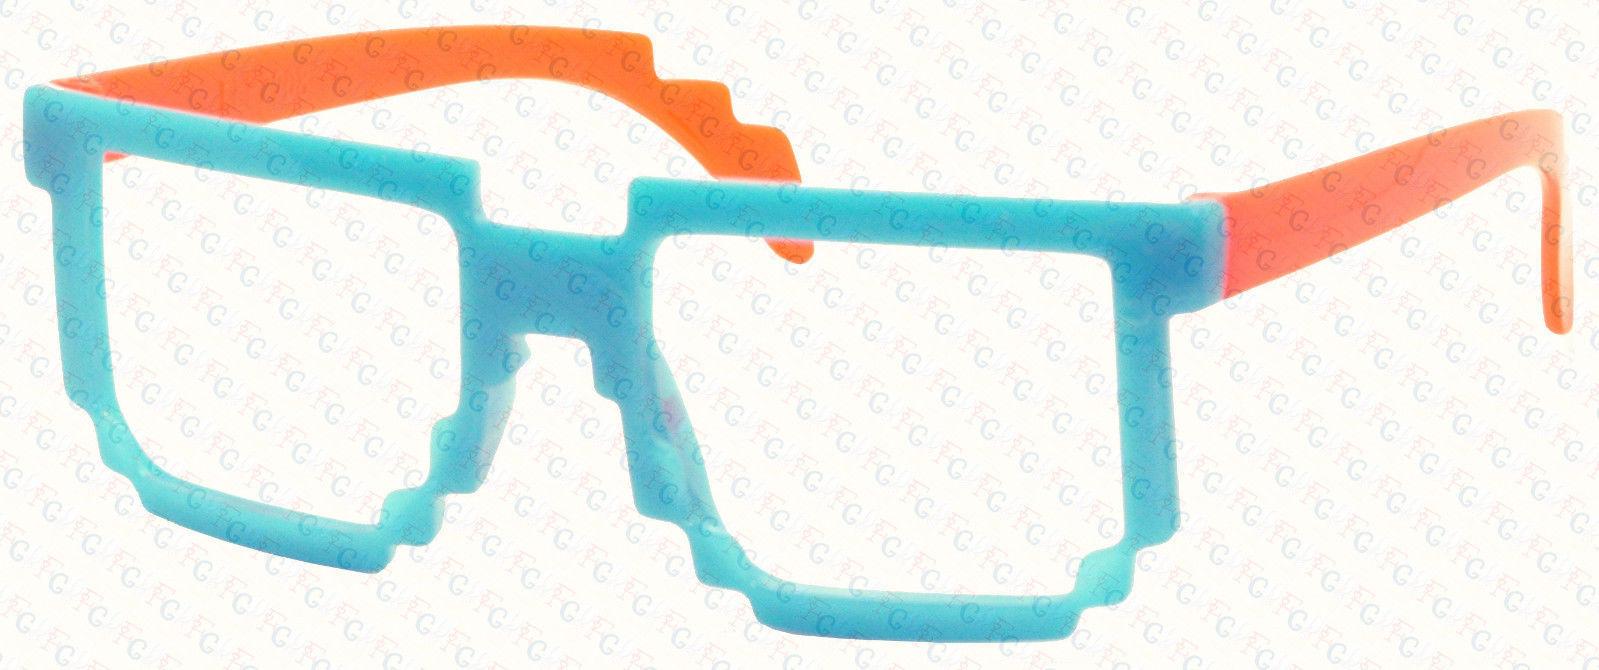 Retro Classic 8-Bit Pixel Geek Gamer Pixelated Glass Frame for Kids 3-12 NO LENS